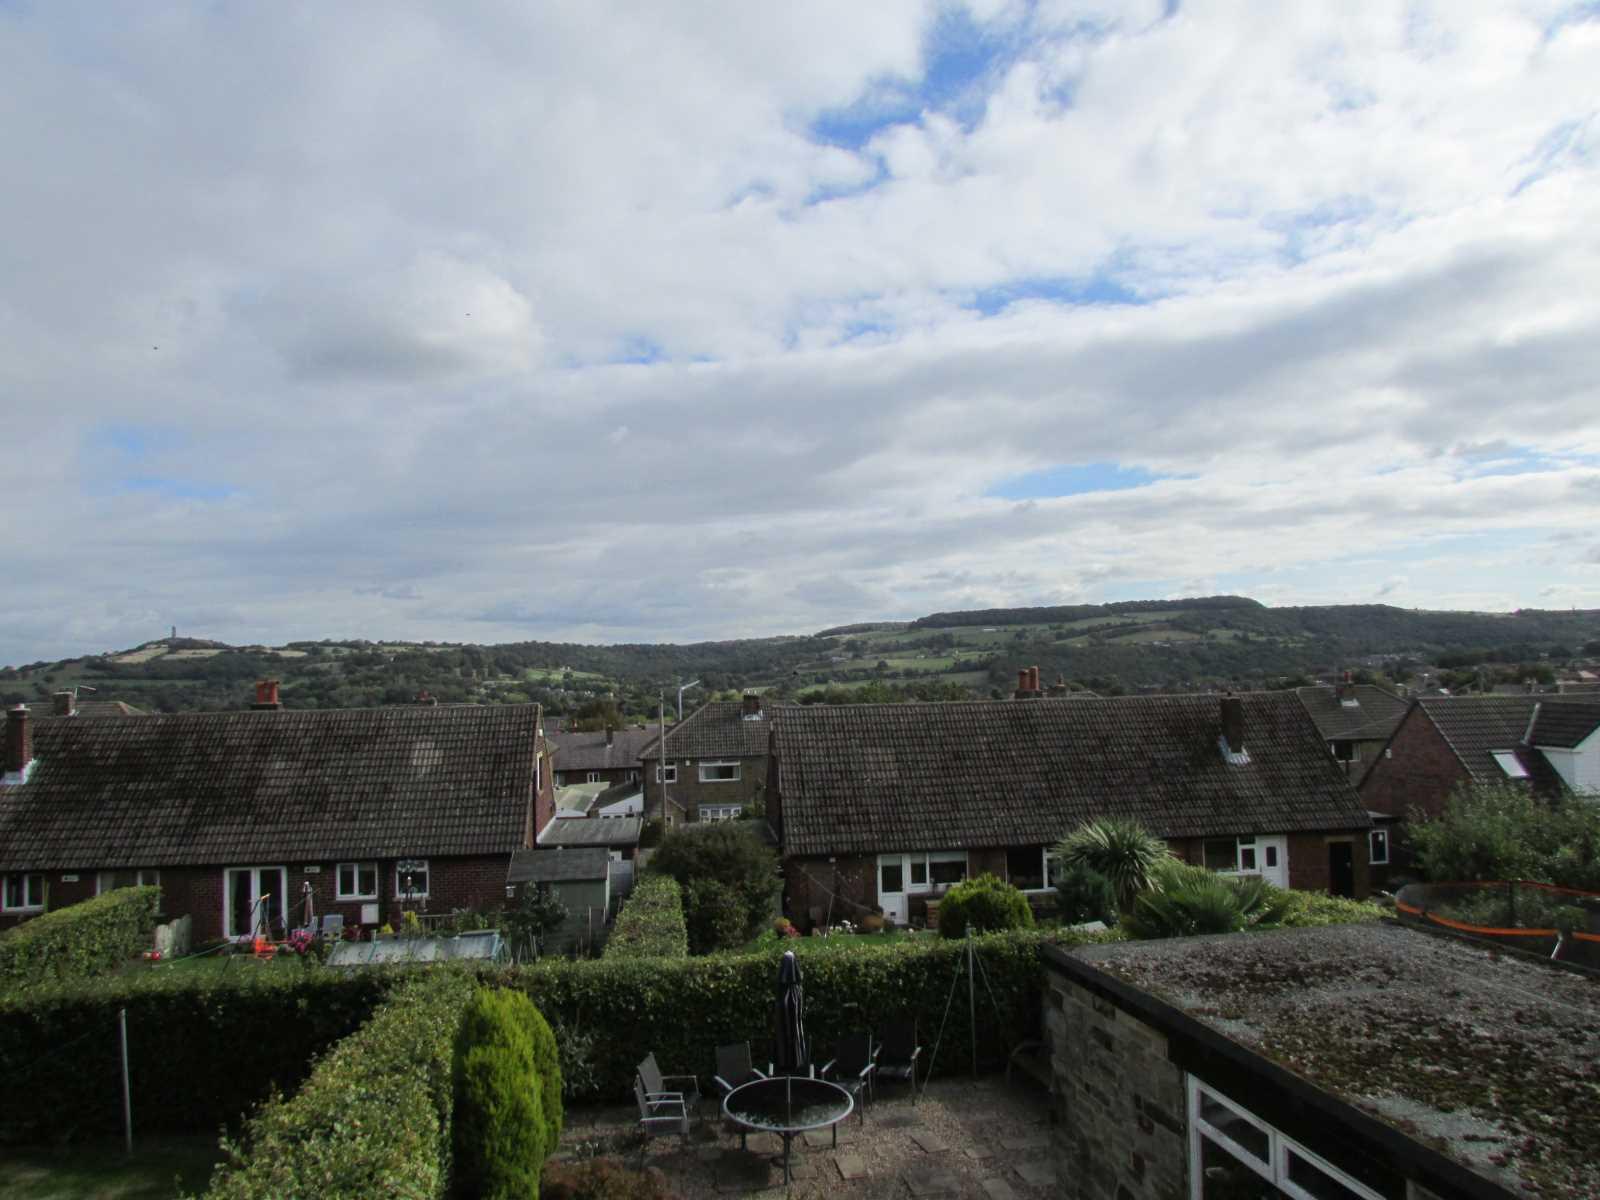 11 Moorside Honley, Holmfirth, HD9 6HR